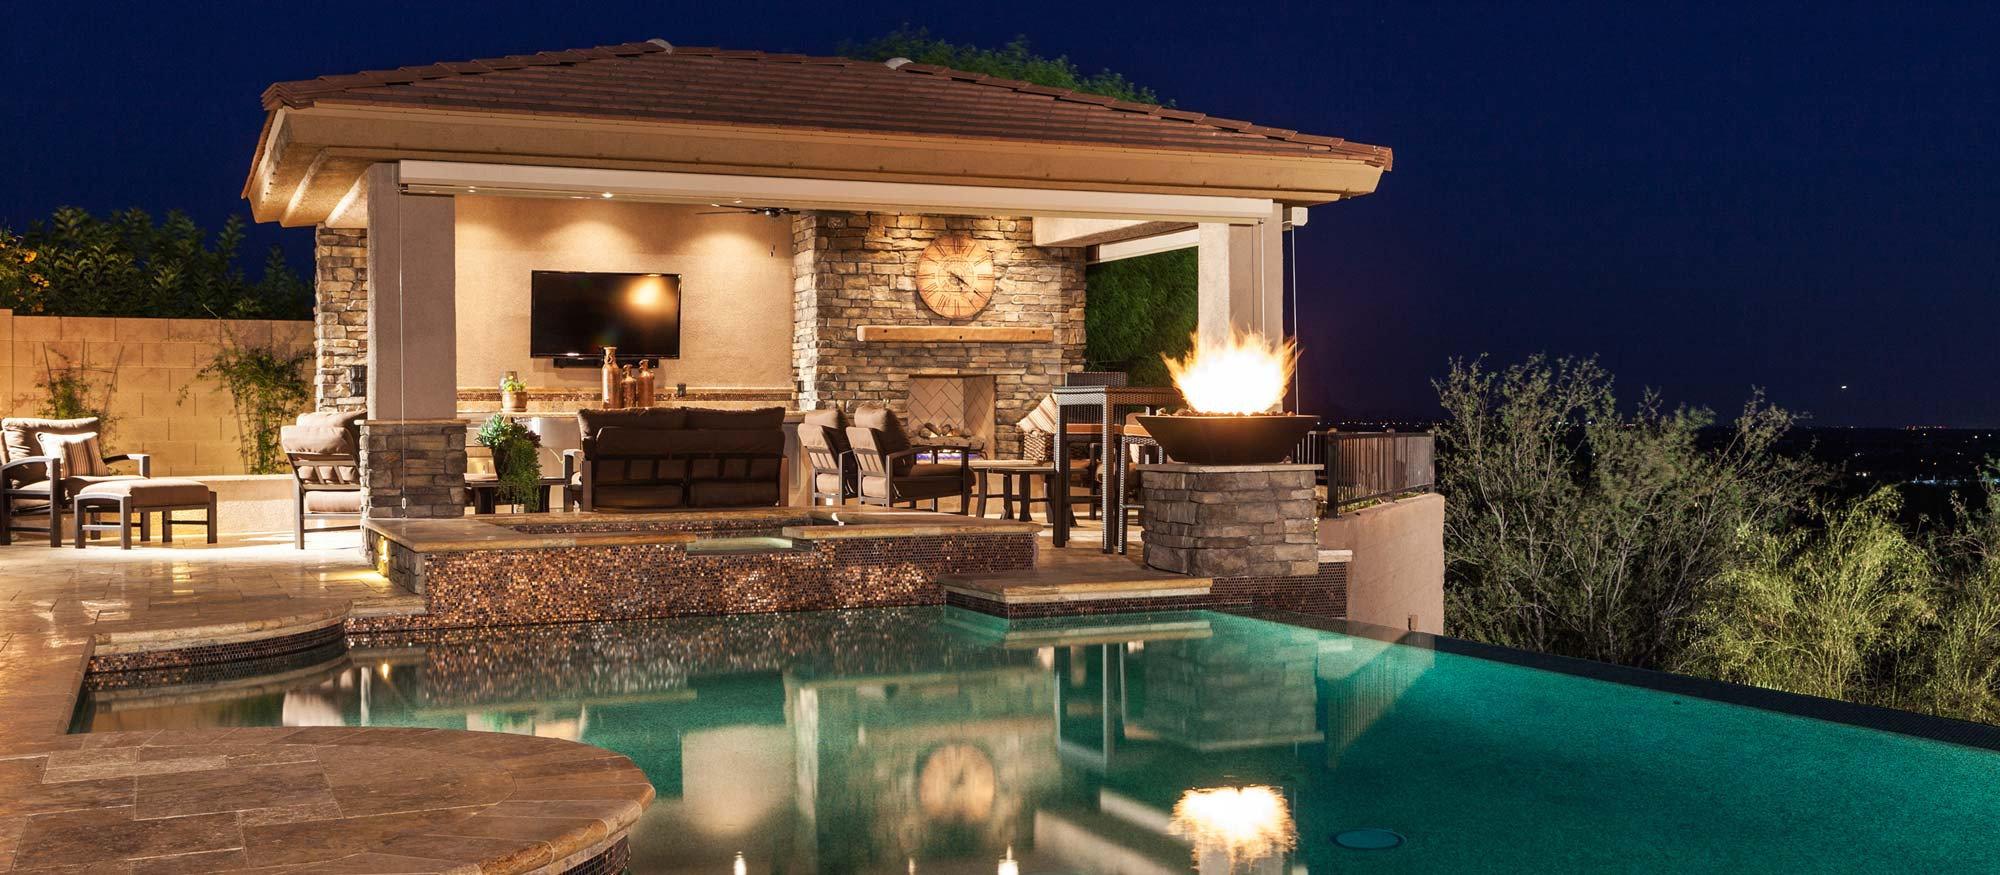 Negative Edge Pool, Spa, Outdoor Kitchen, Ramada, Fireplace